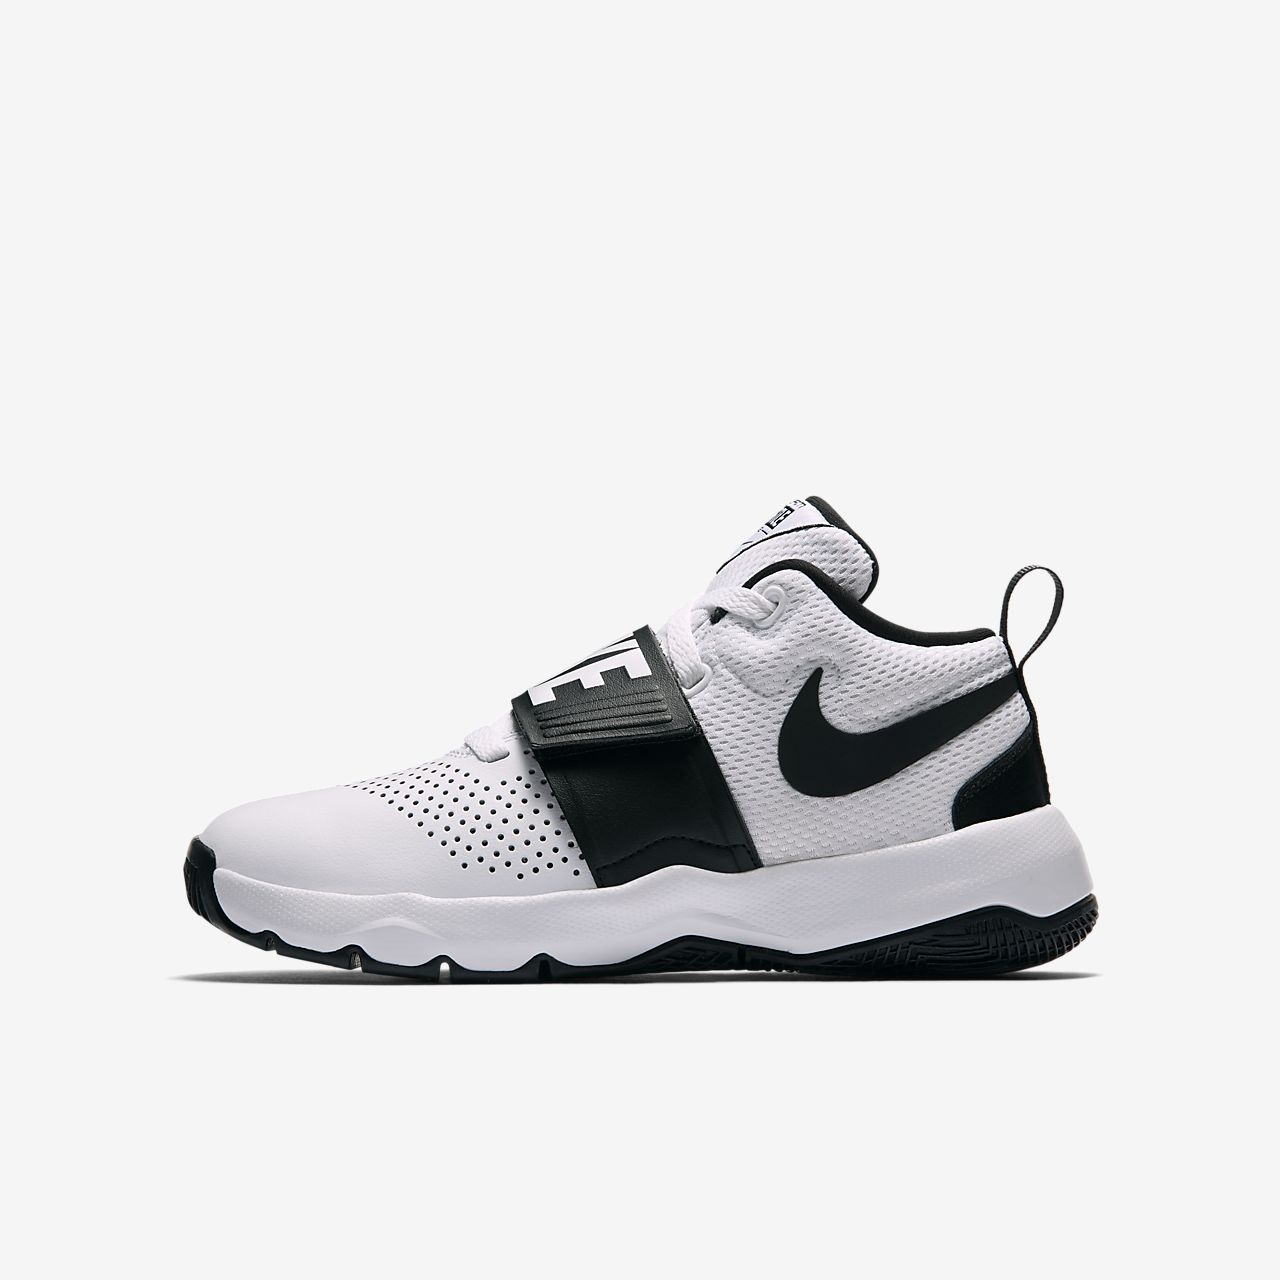 new style 48438 7de7f ... Nike Team Hustle D 8 Zapatillas de baloncesto - Niño a